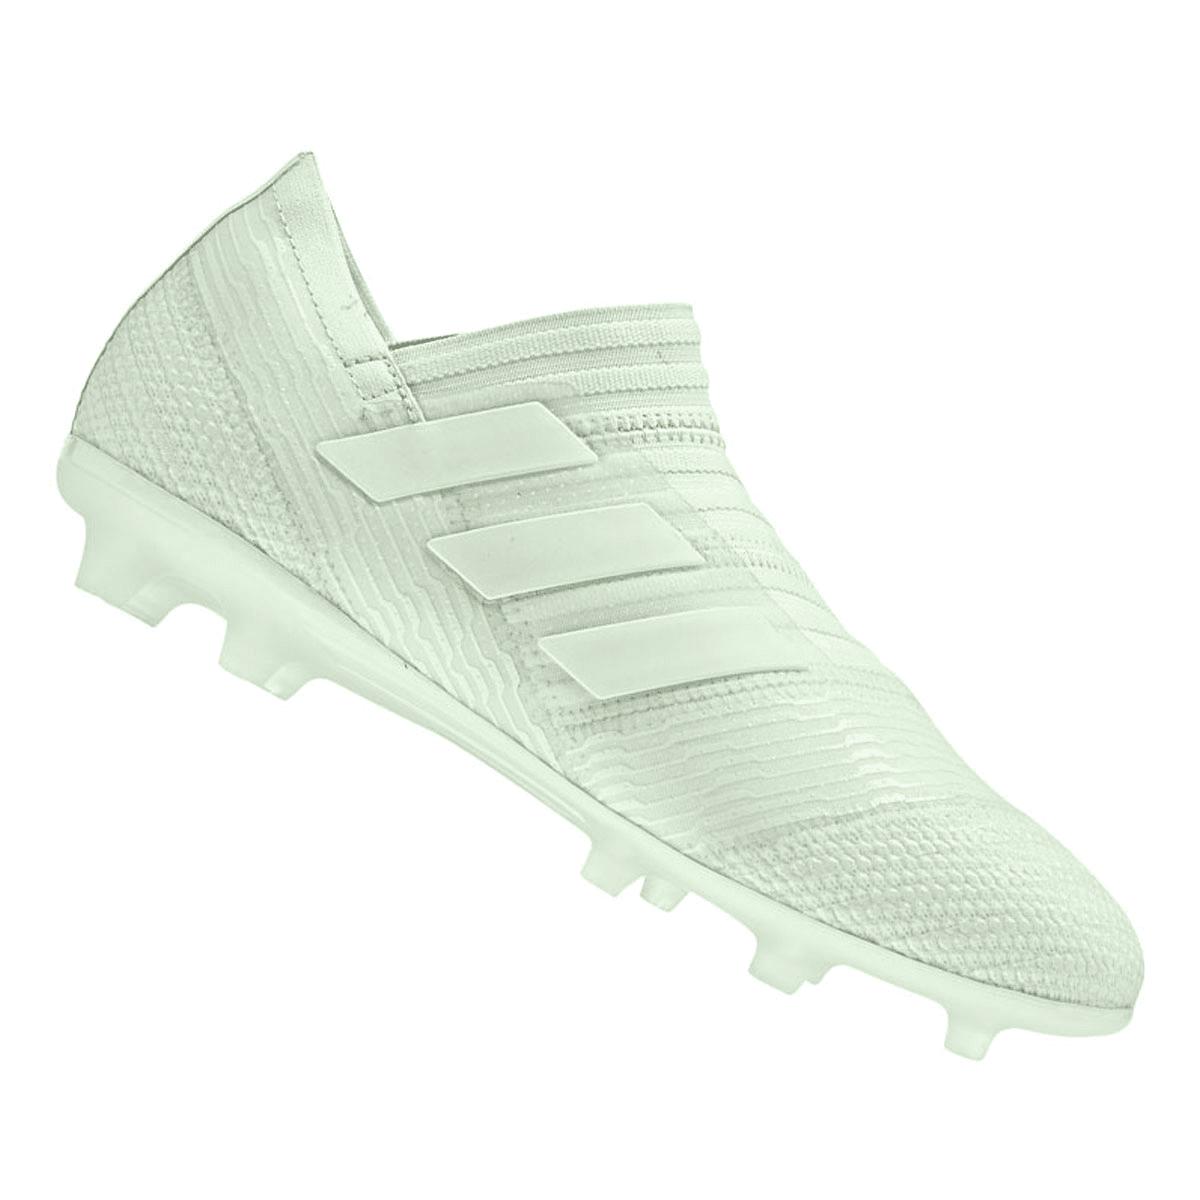 adidas Nemeziz 18+ FG Kinderfußballschuh silber | soccercity